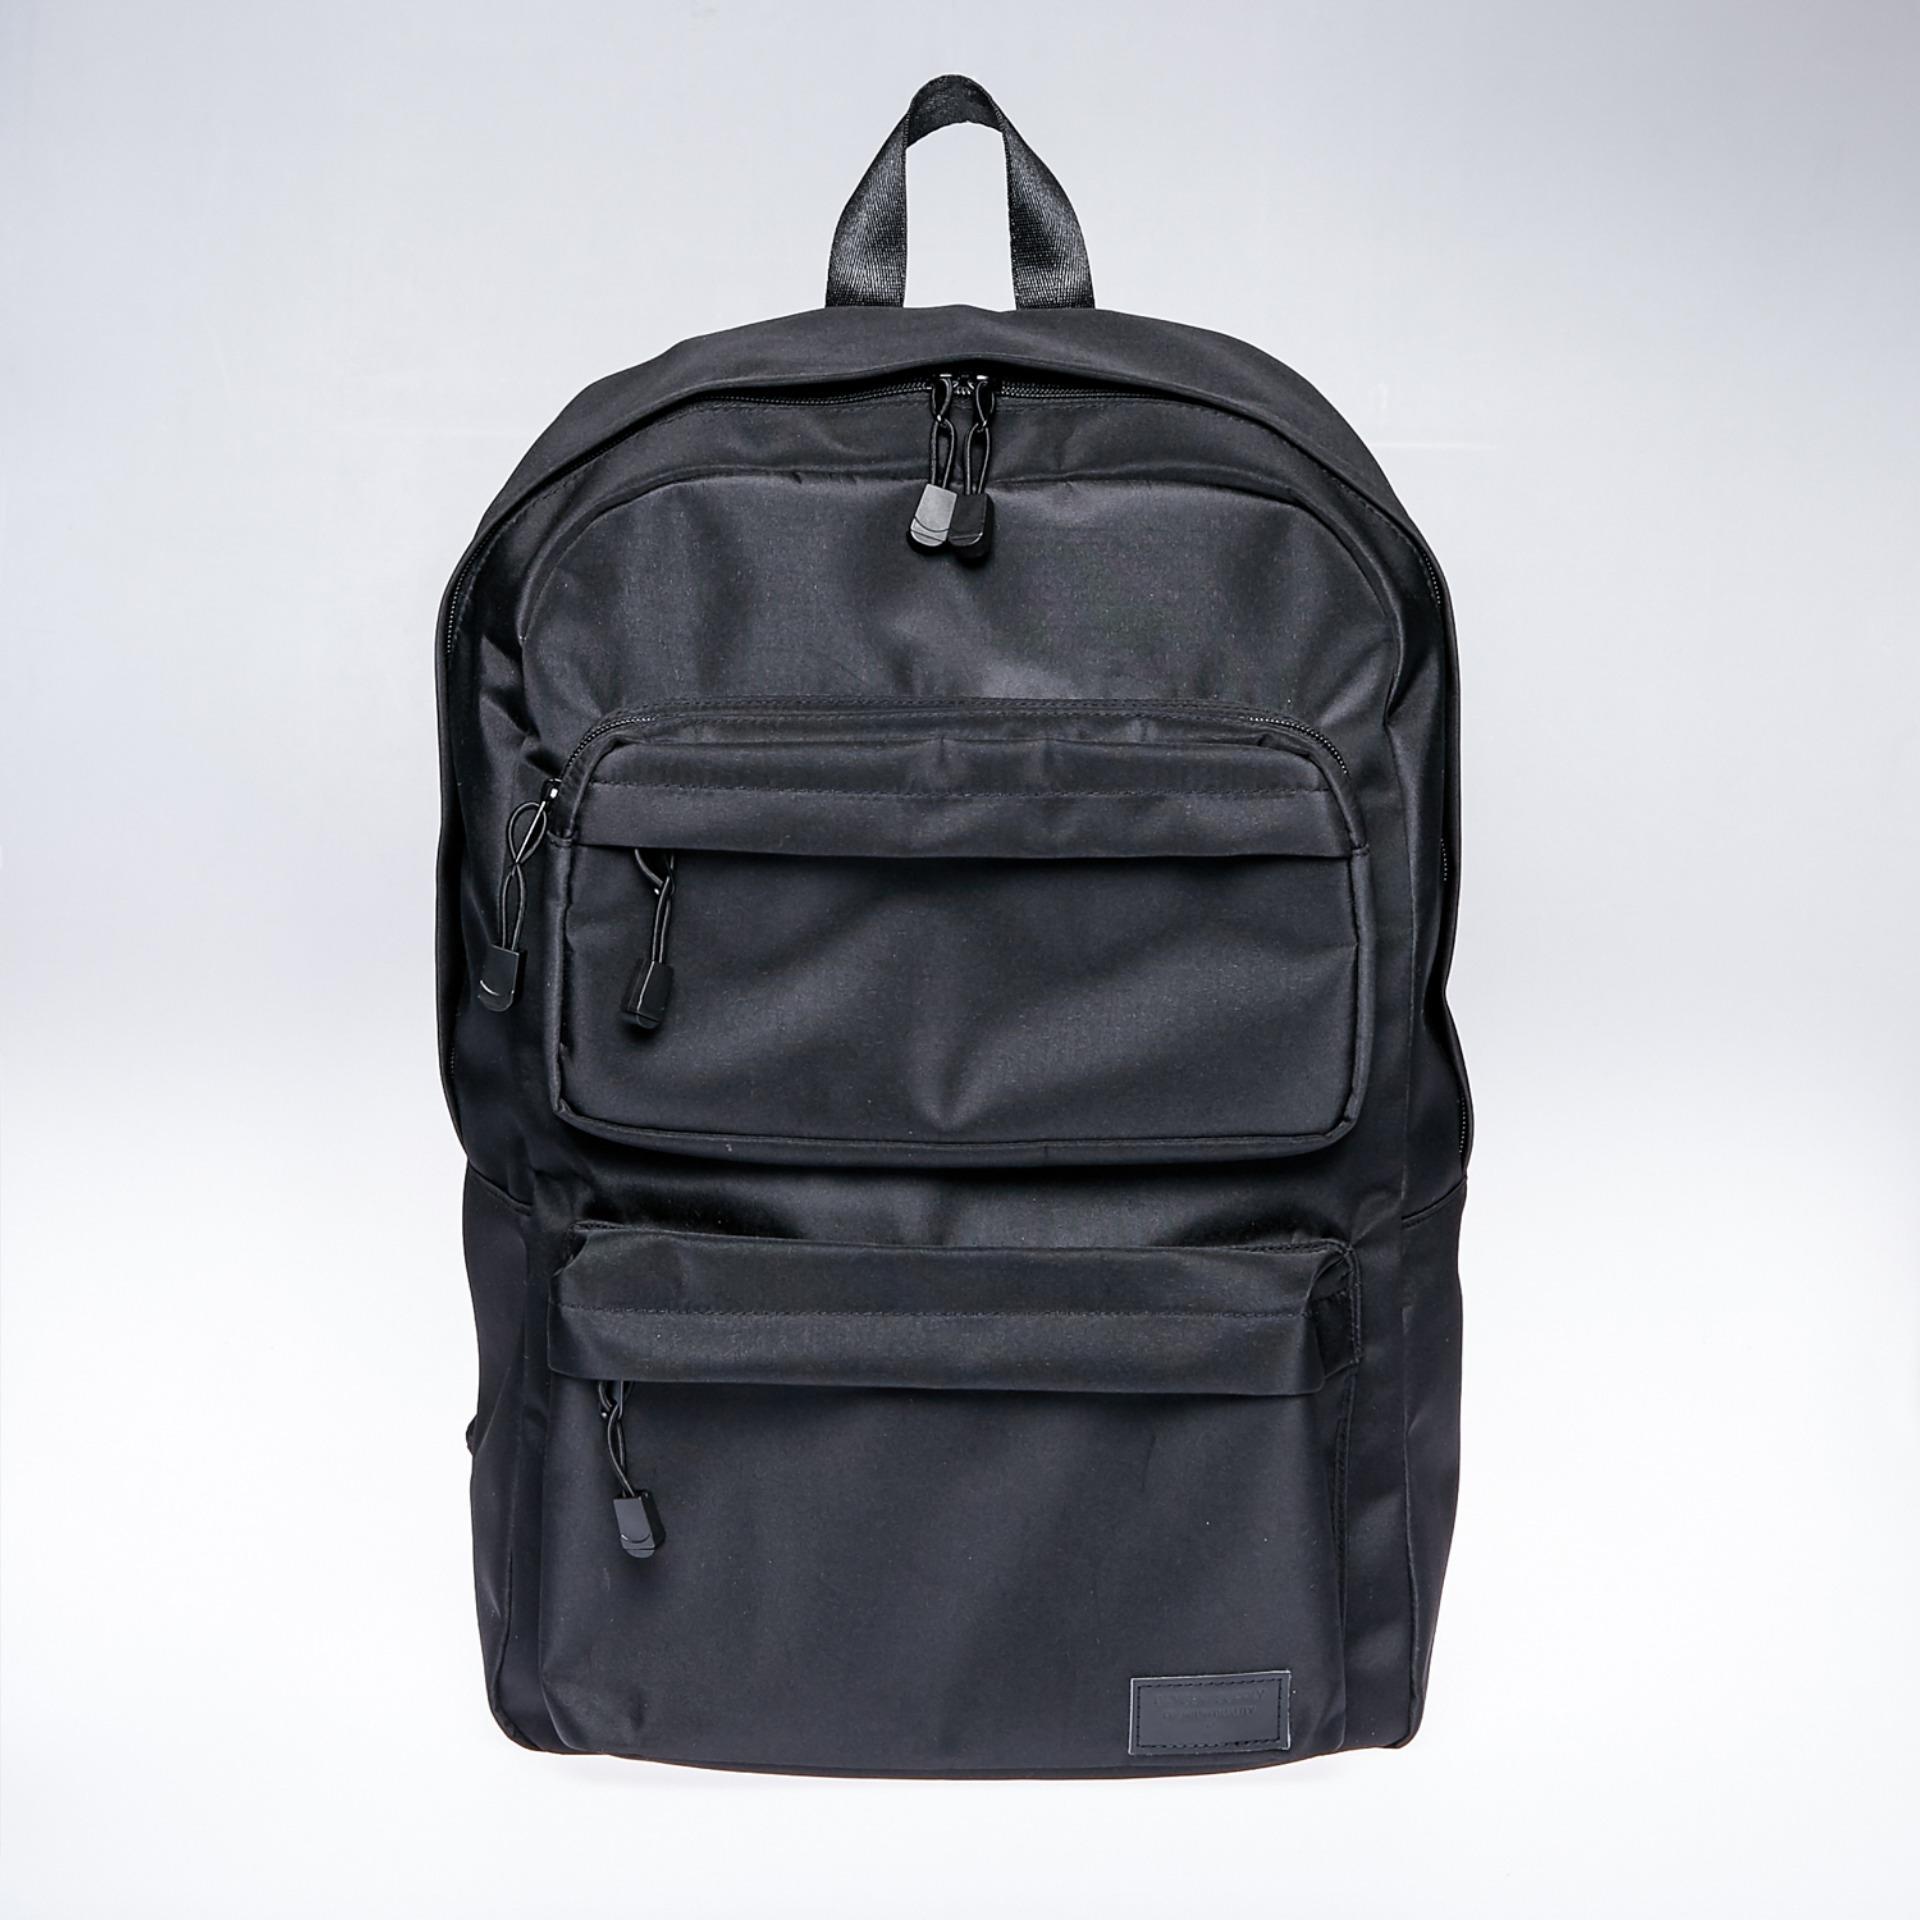 Backpack With Multiple Pockets Black